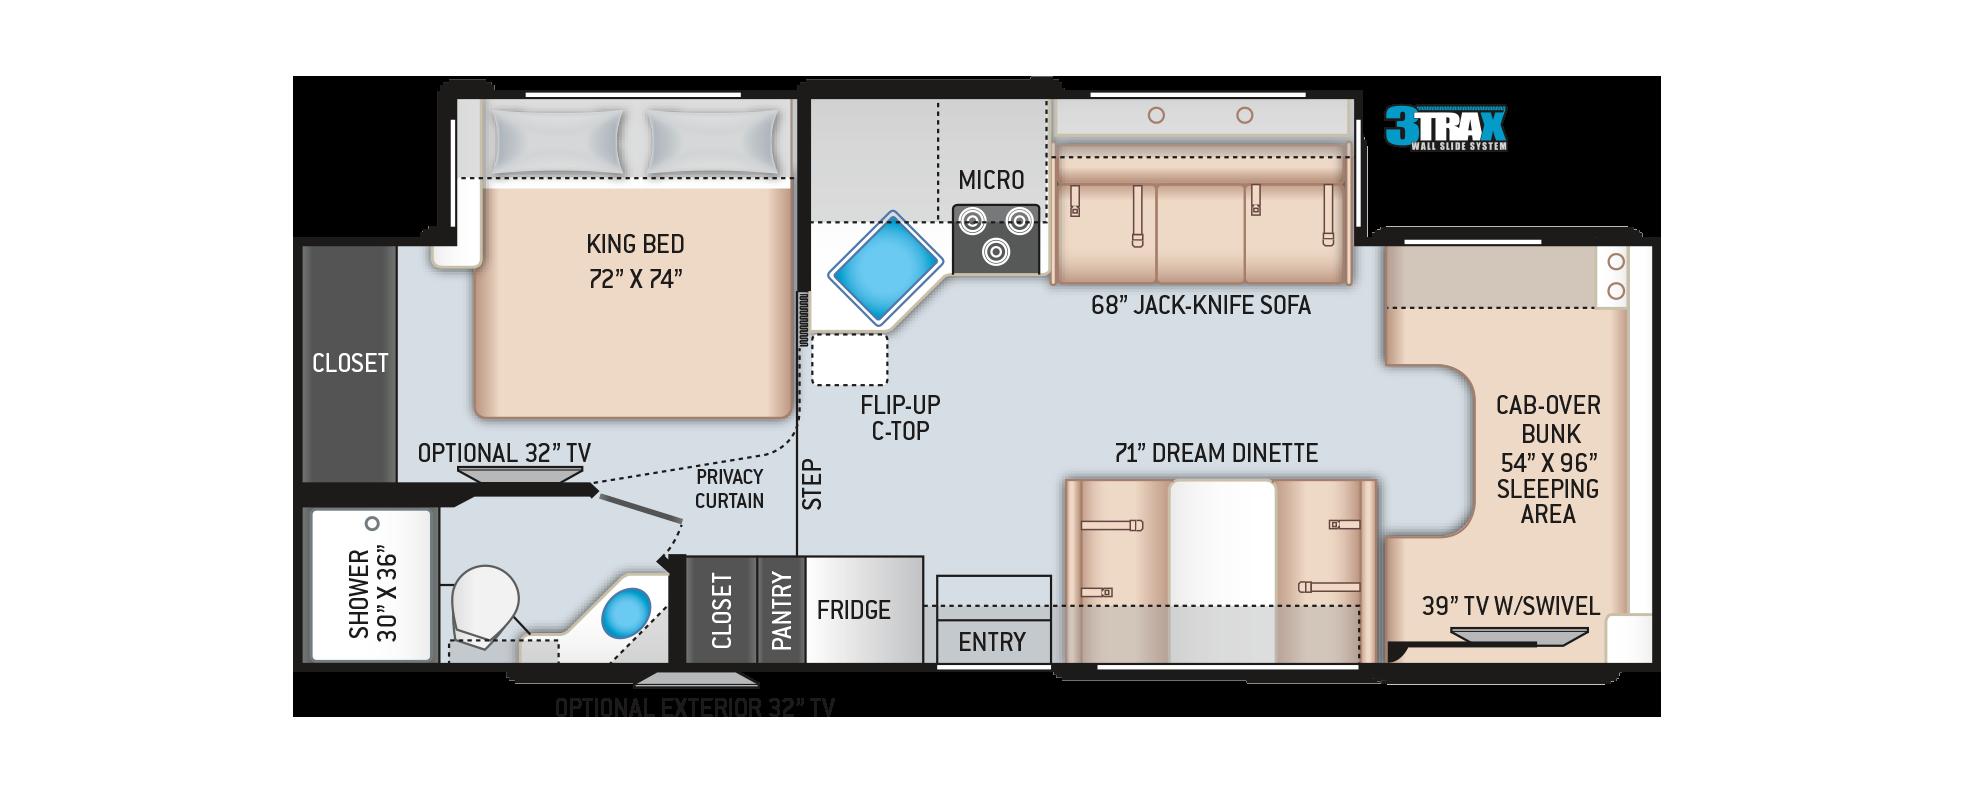 Four Winds Class C Motorhome 27R Floor Plan